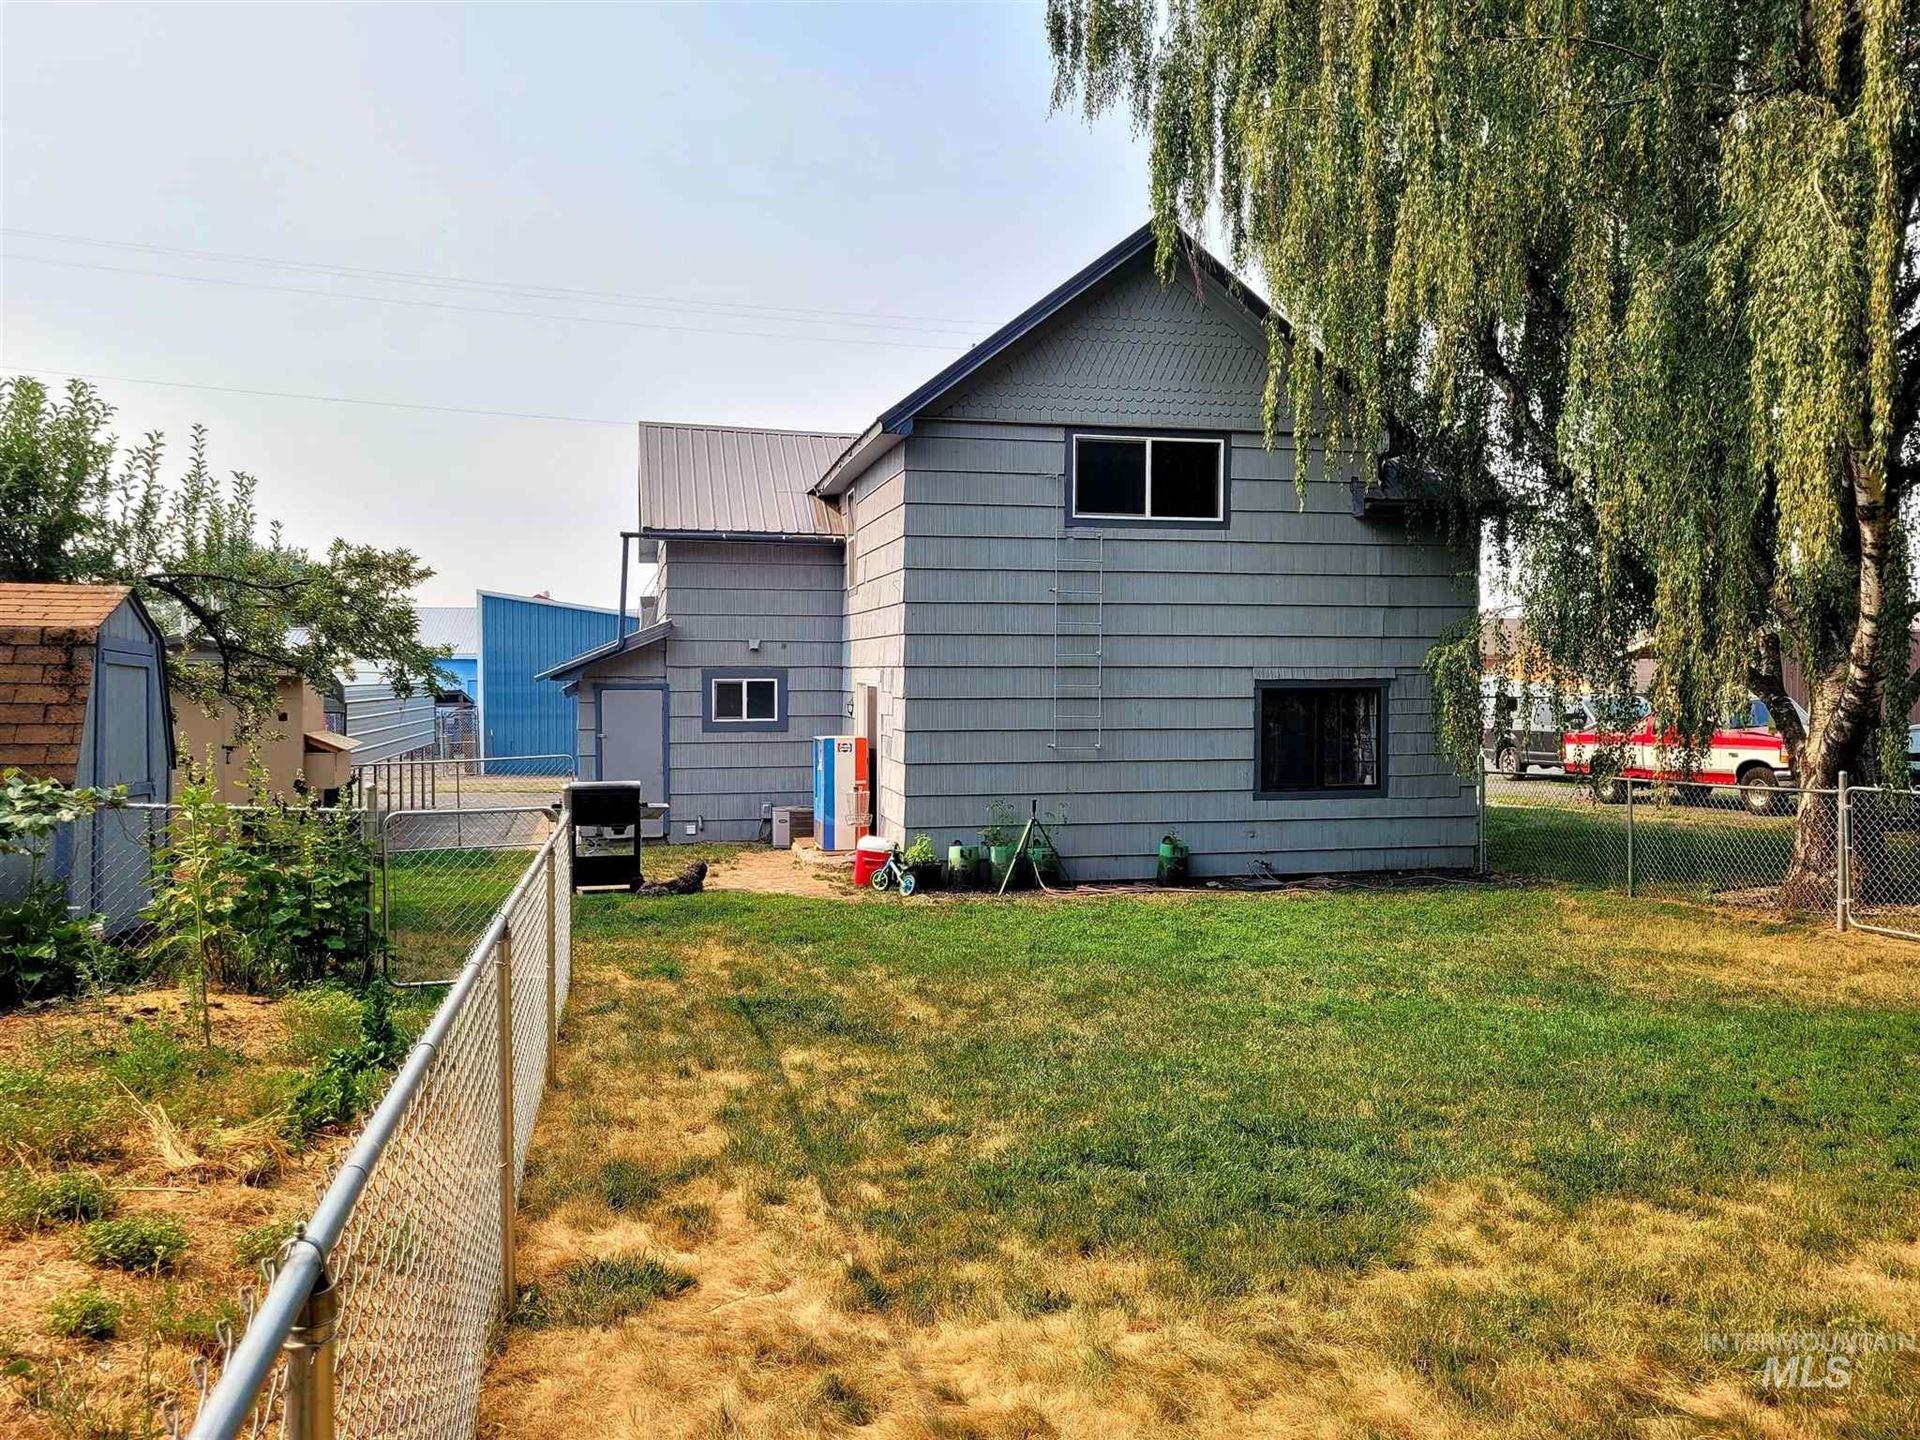 Photo of 112 S Tamarack St., Genesee, ID 83832 (MLS # 98810680)